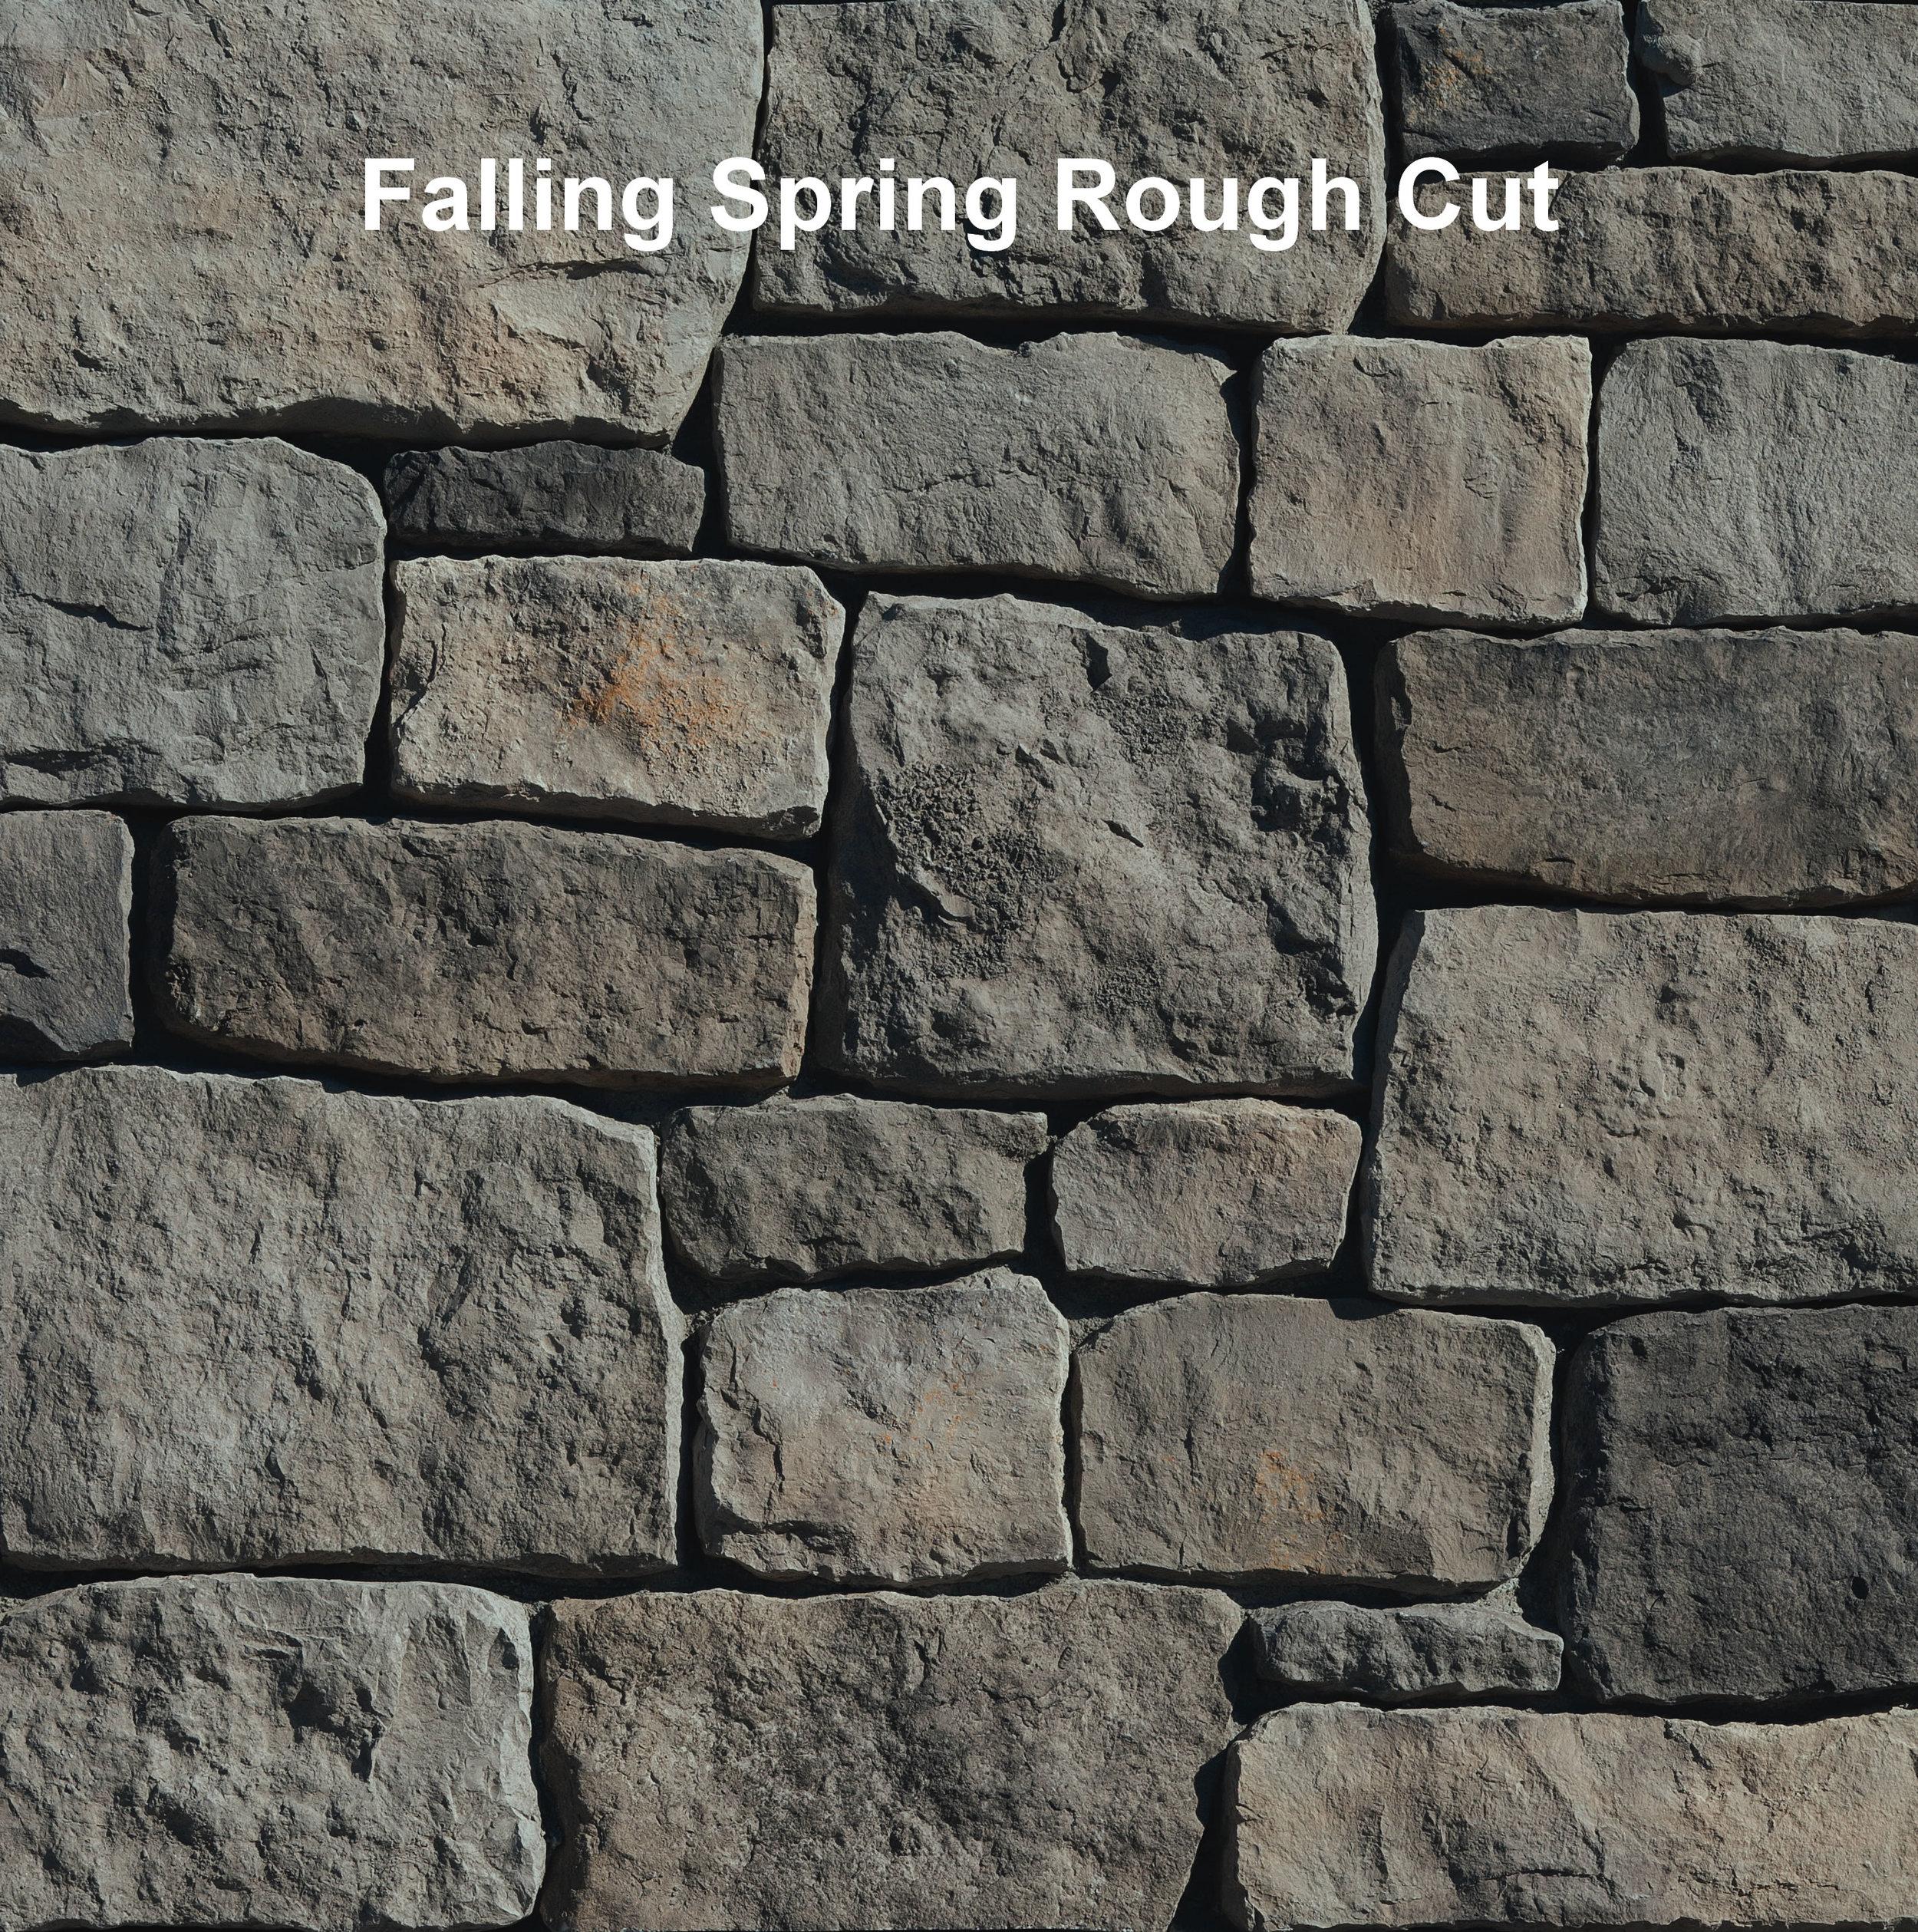 ES RoughCut_Falling Spring_051916.jpg